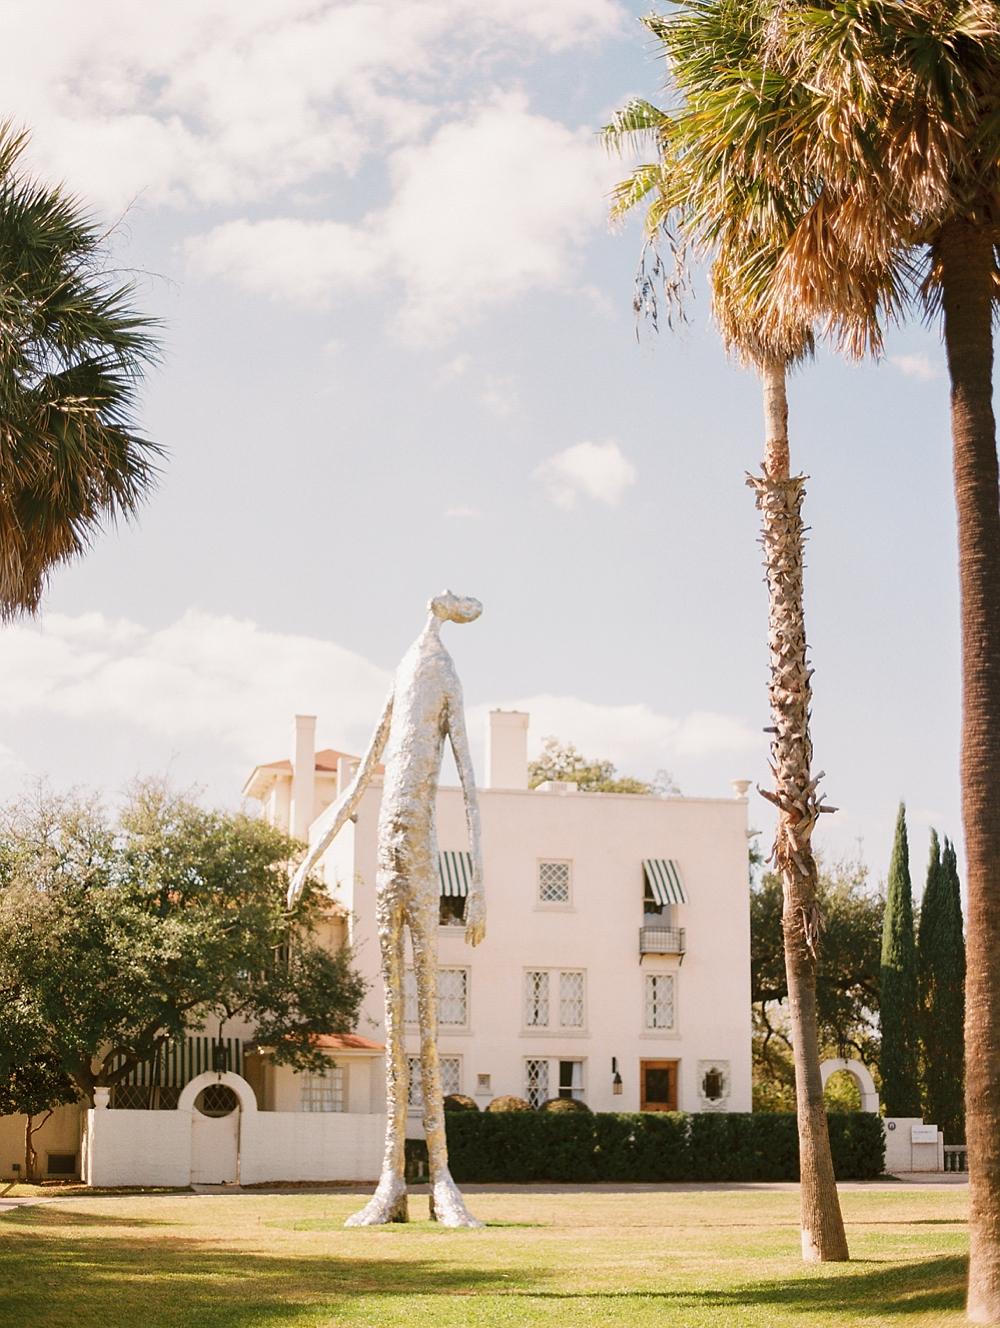 kristin-la-voie-photography-Austin-Wedding-Photographer-laguna-gloria-commodore-perry-estate-engagement-74